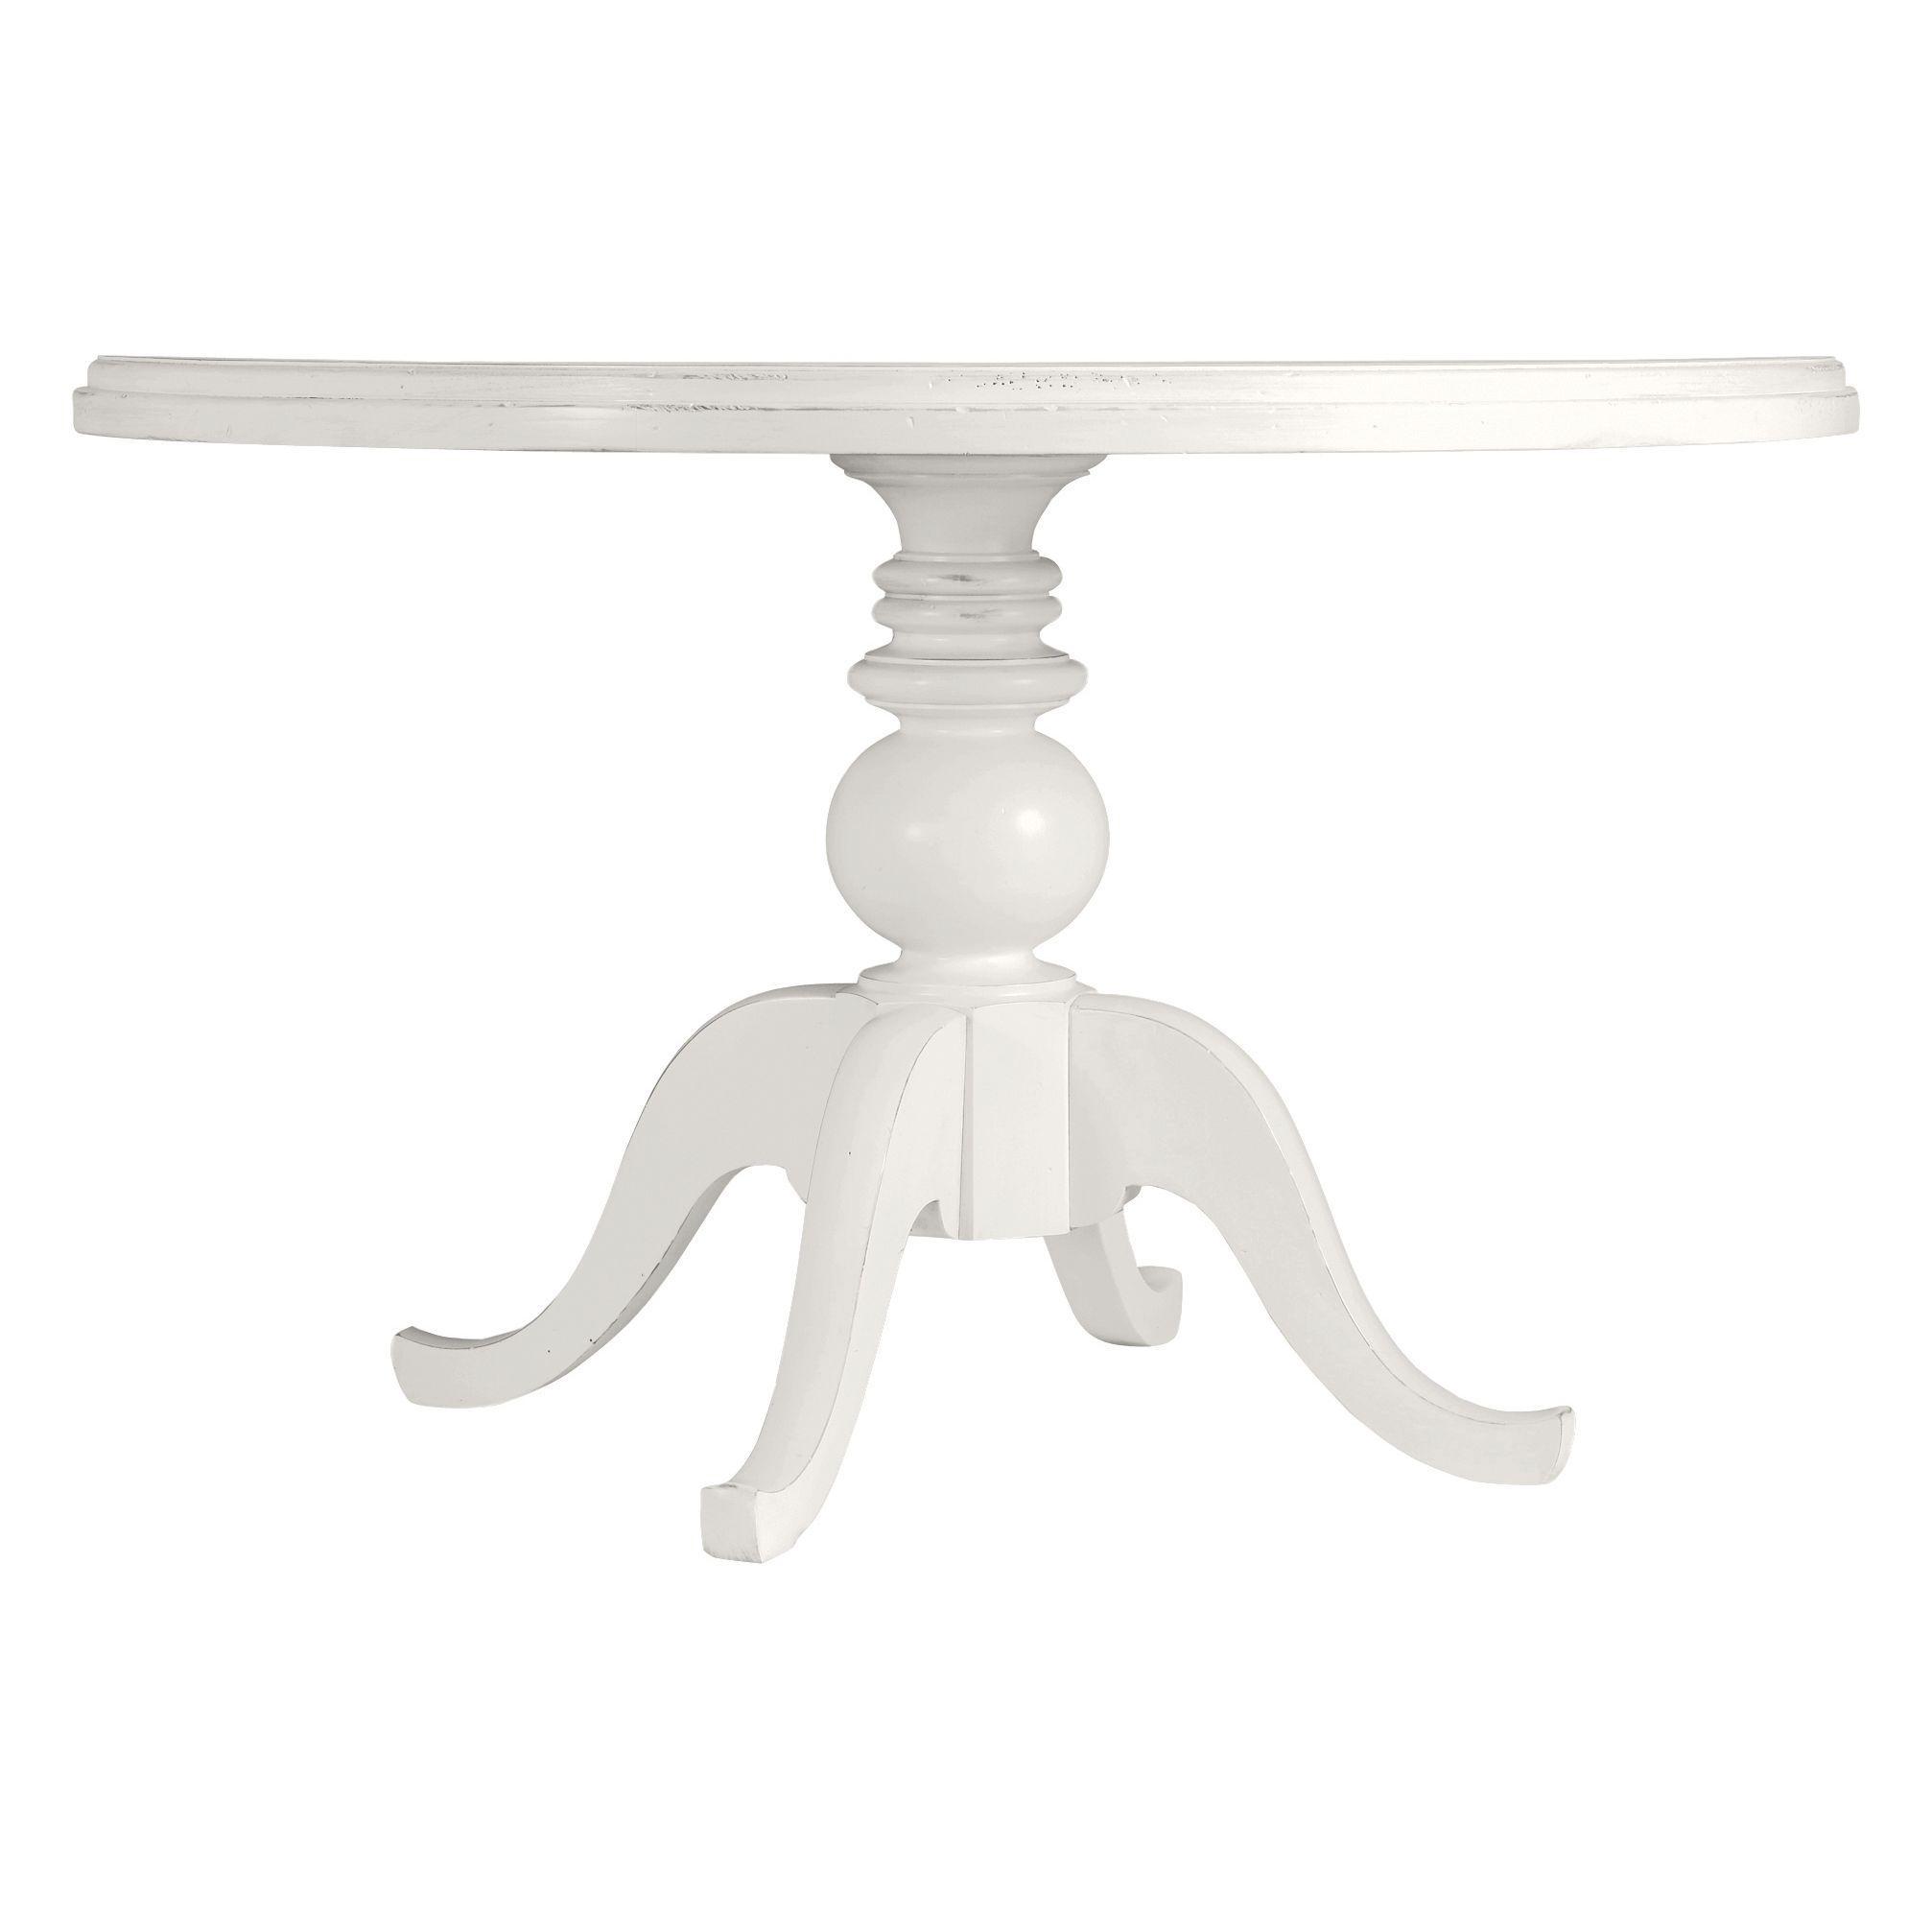 Stanley Furniture Coastal Living Retreat Round Pedestal Table, Painted Top - Item Number: 411-21-37